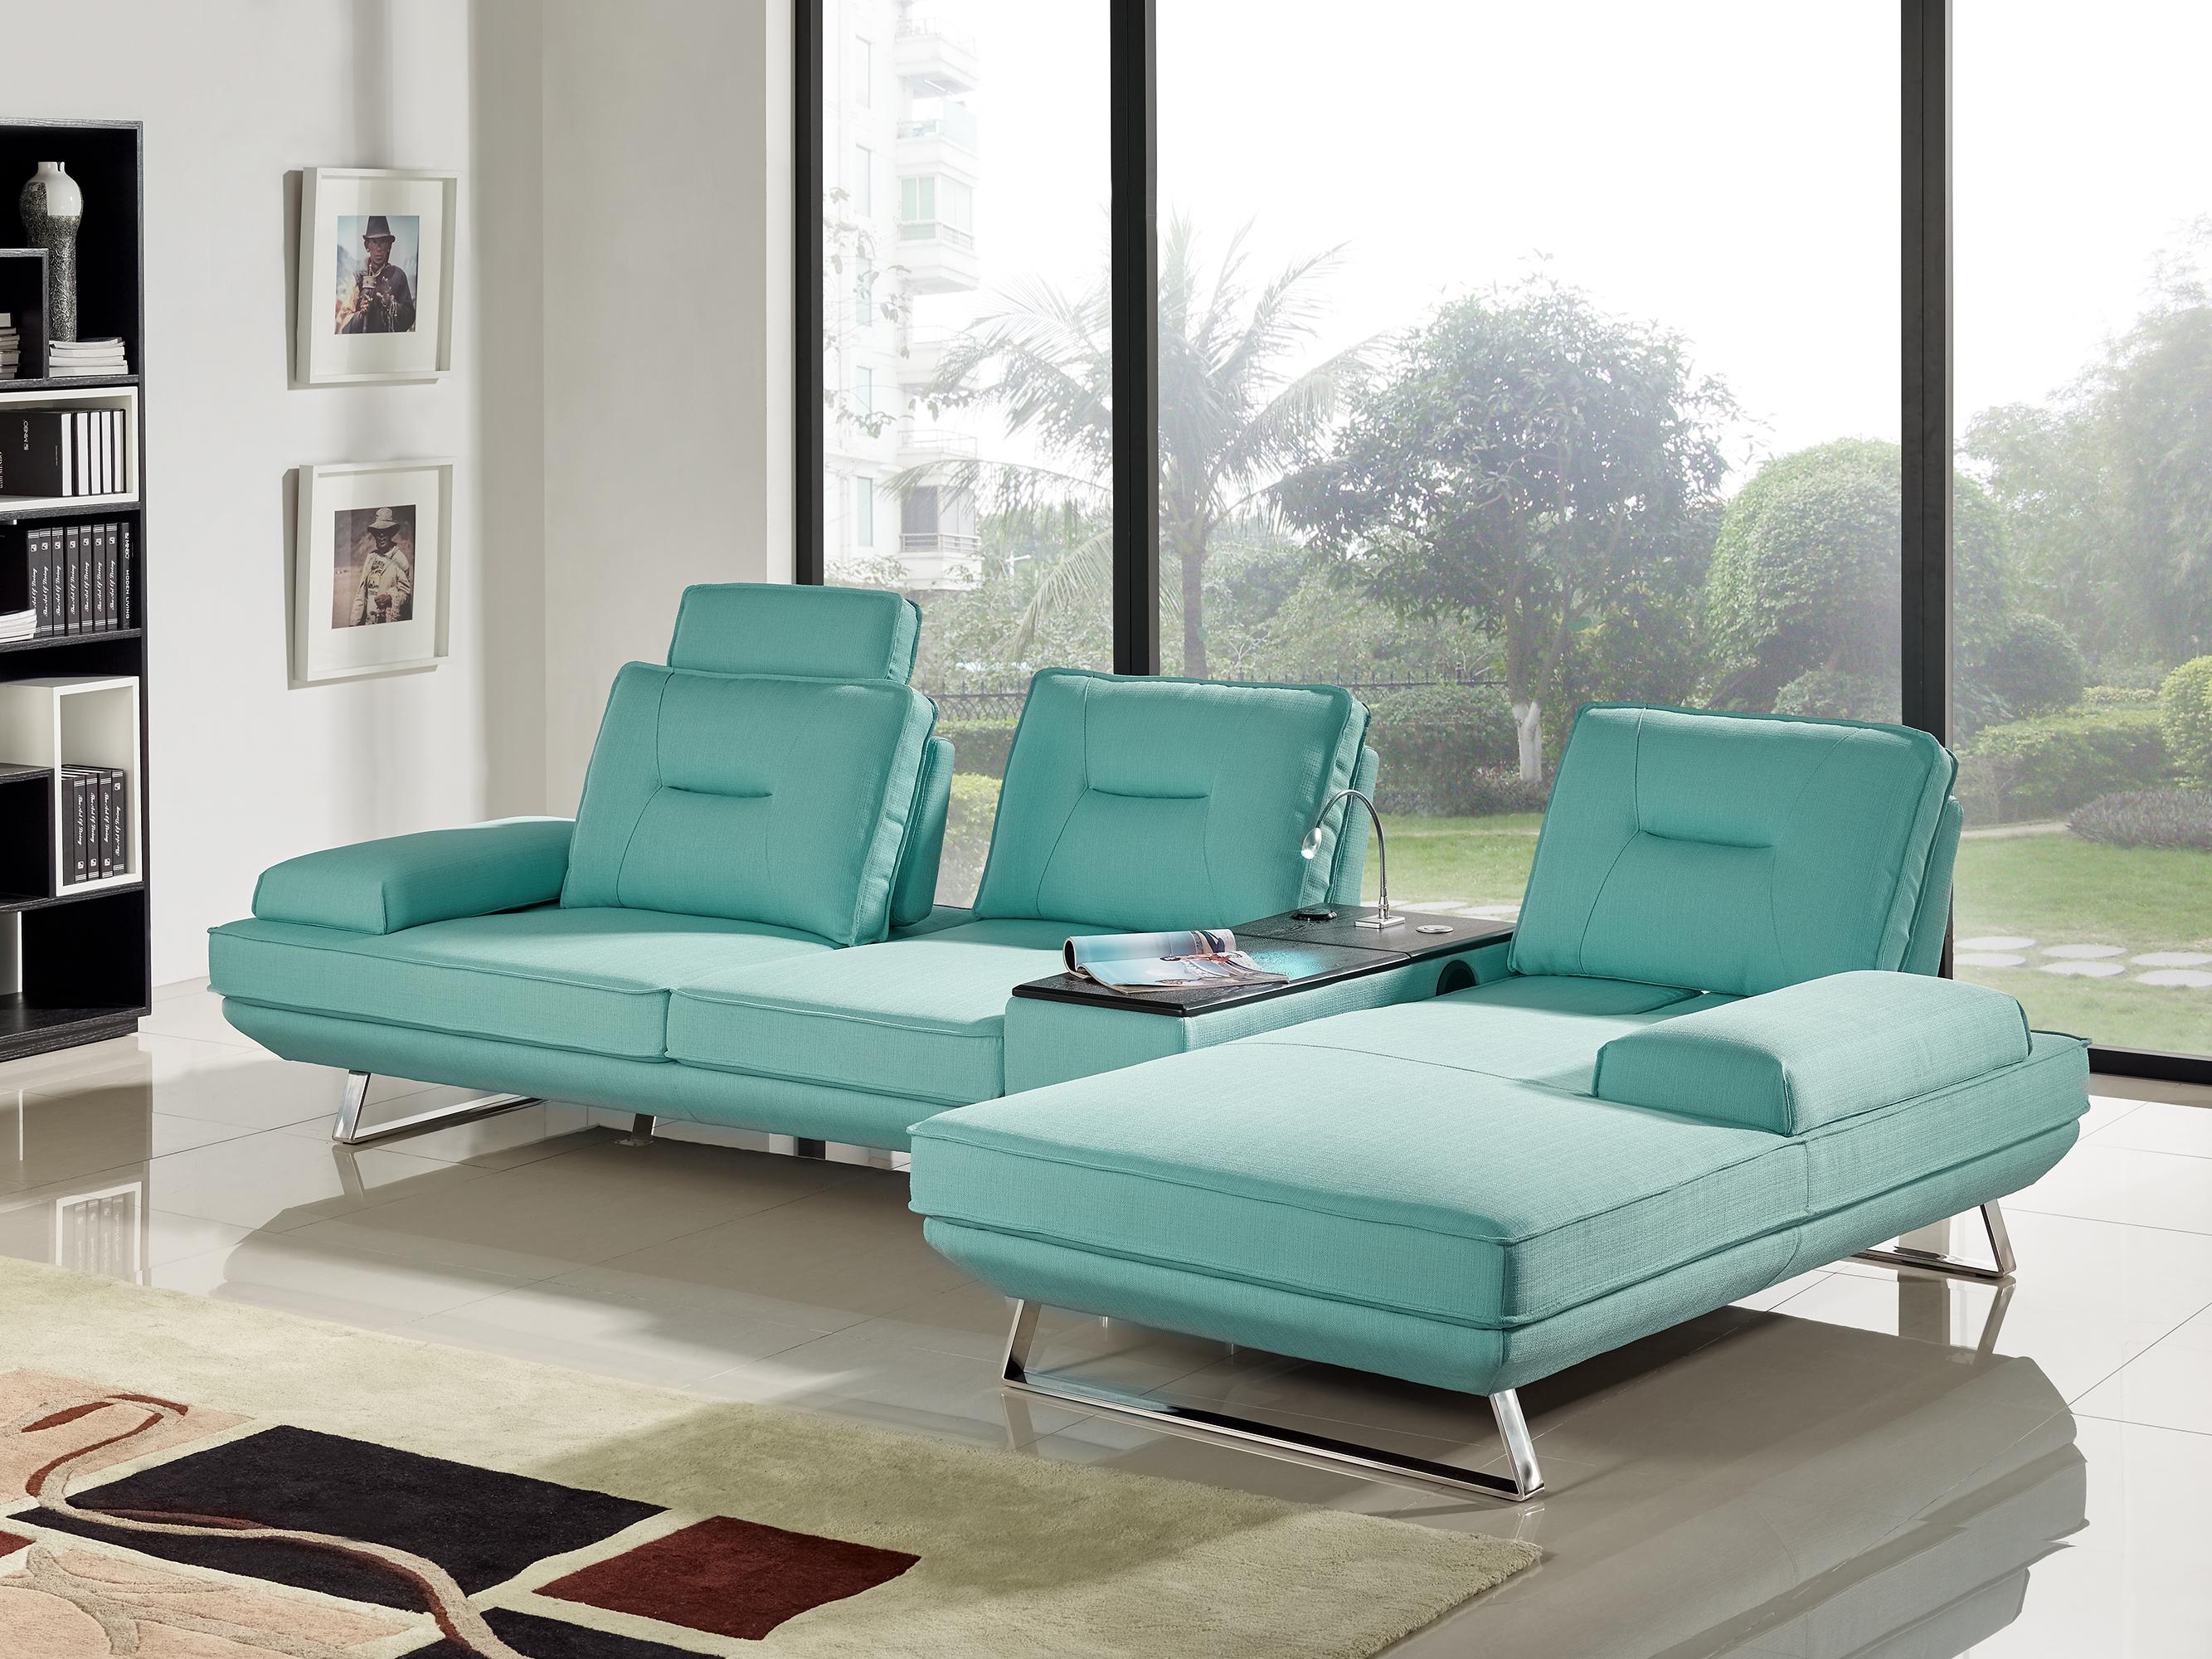 Nova LifeStyle To Showcase Its Latest Furniture Collection At The Winter  2016 Las Vegas Market Nasdaq:NVFY